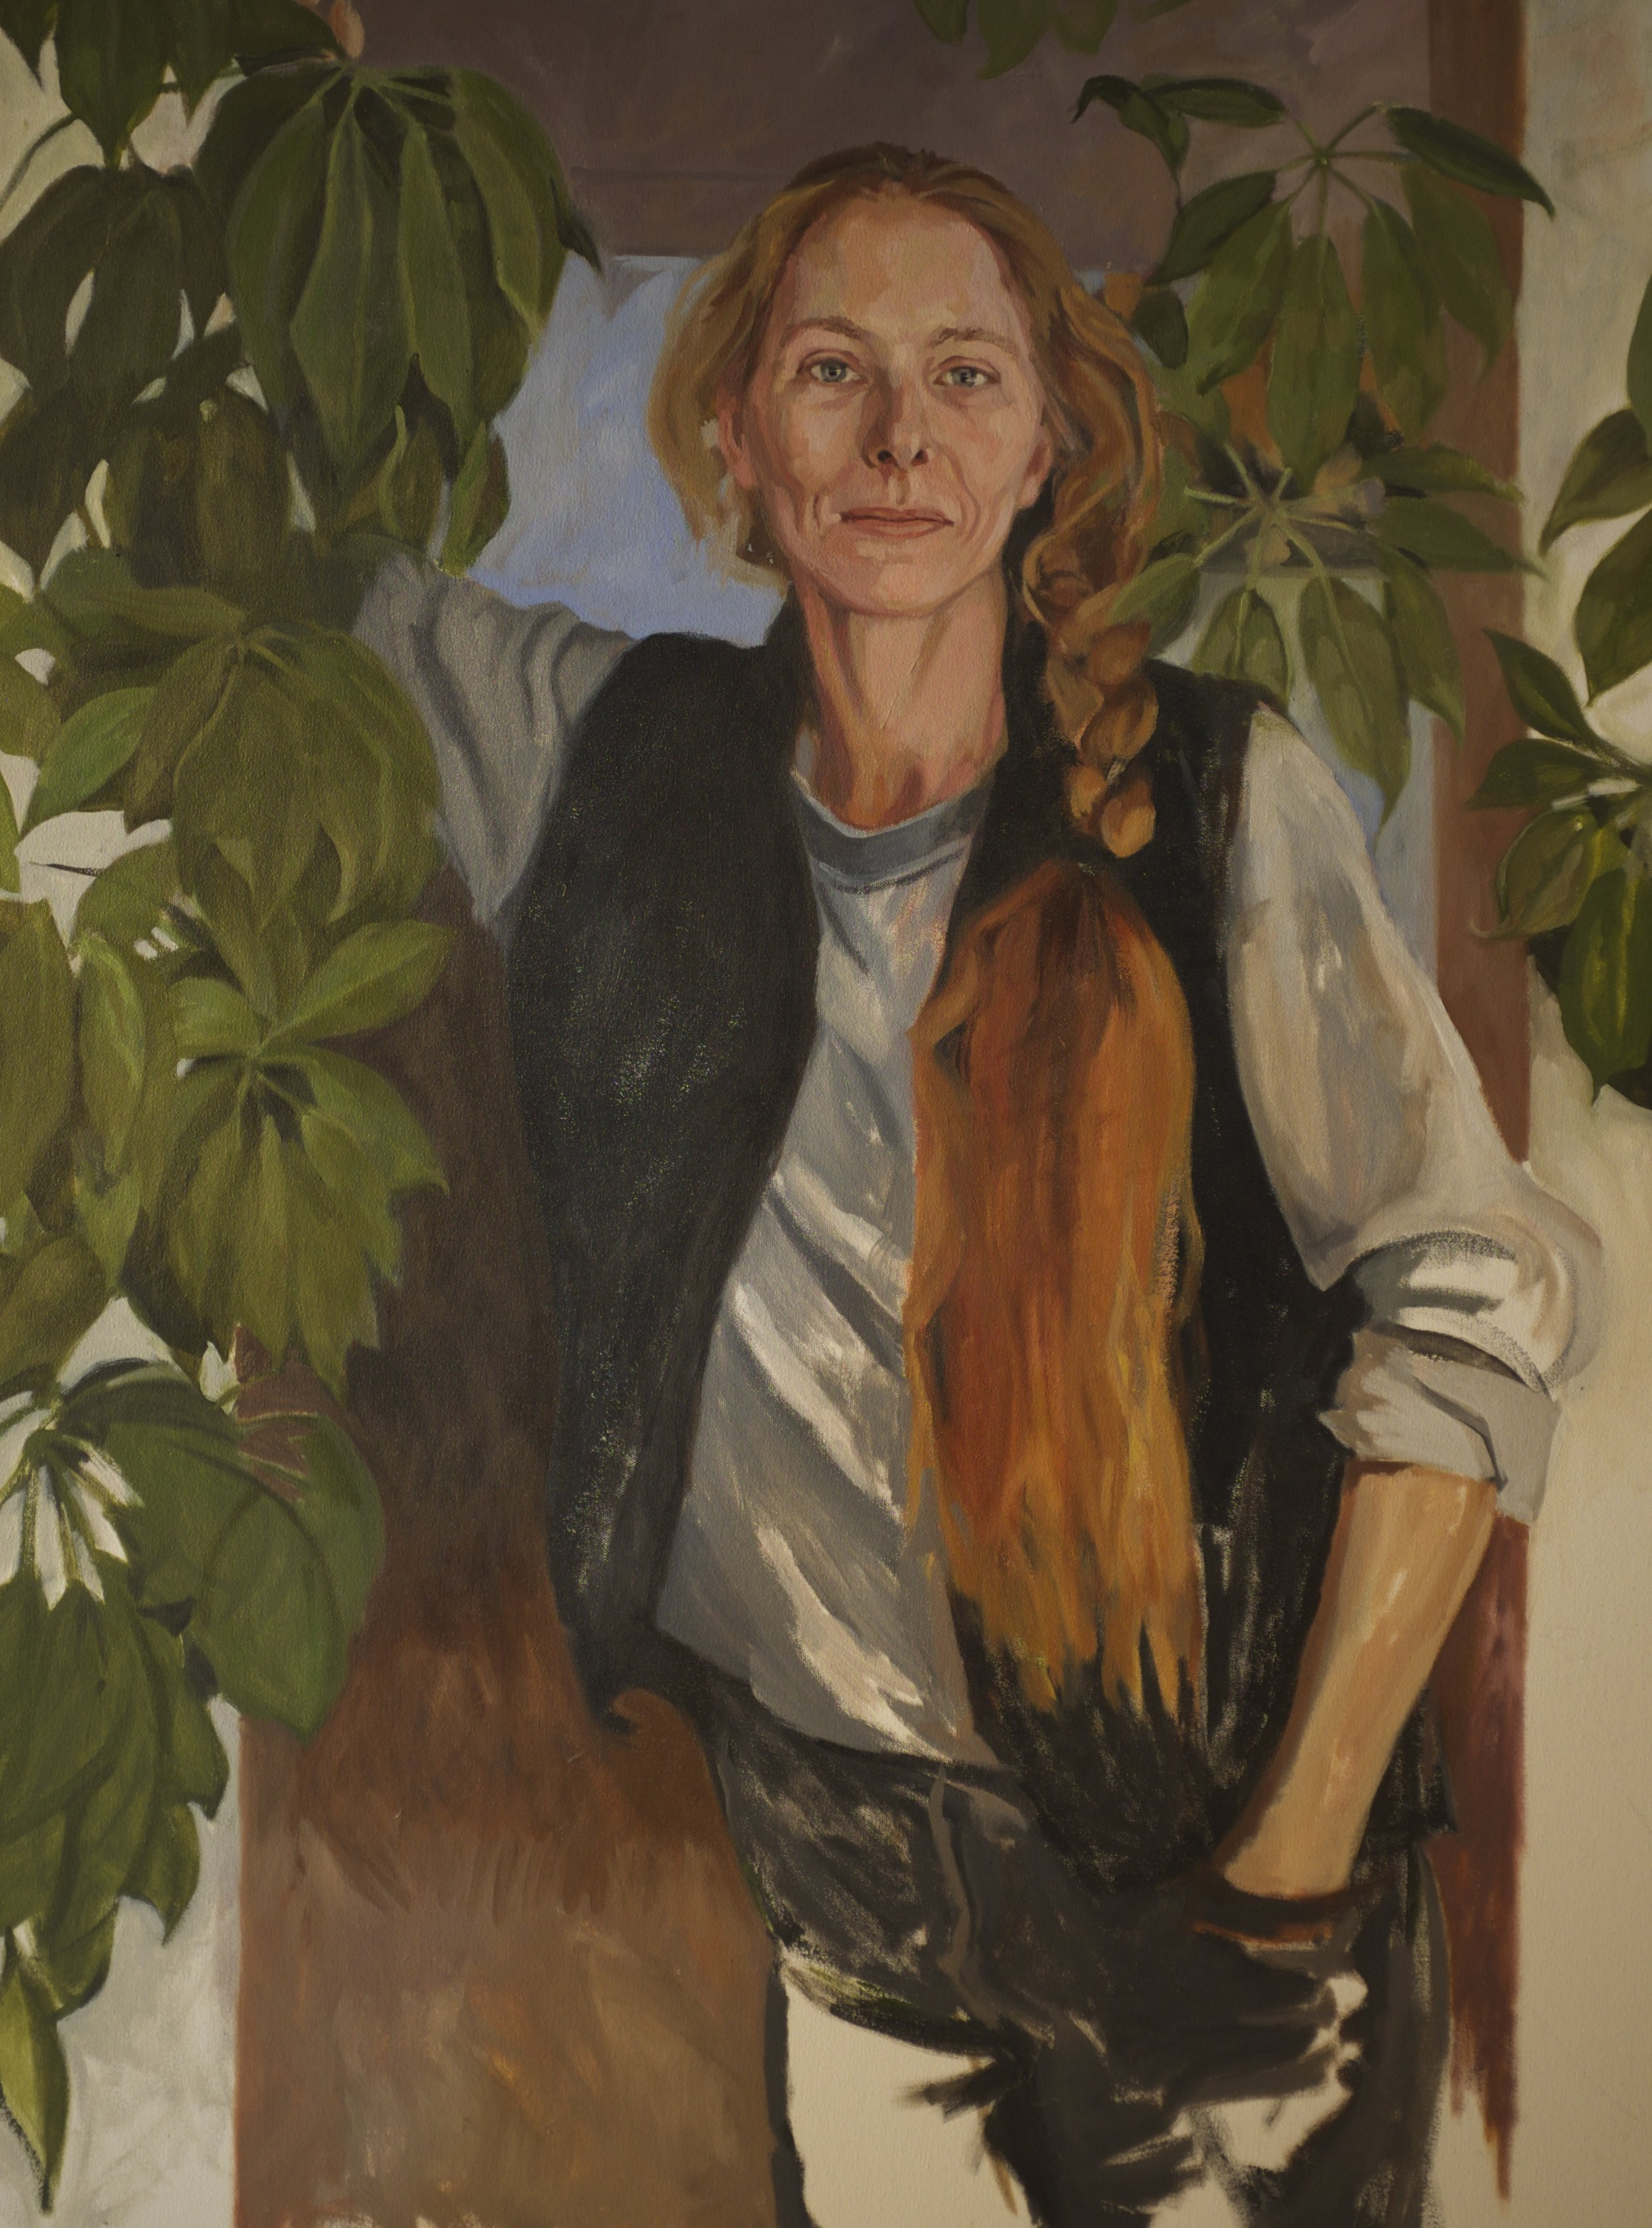 Linda Baker-Cimini